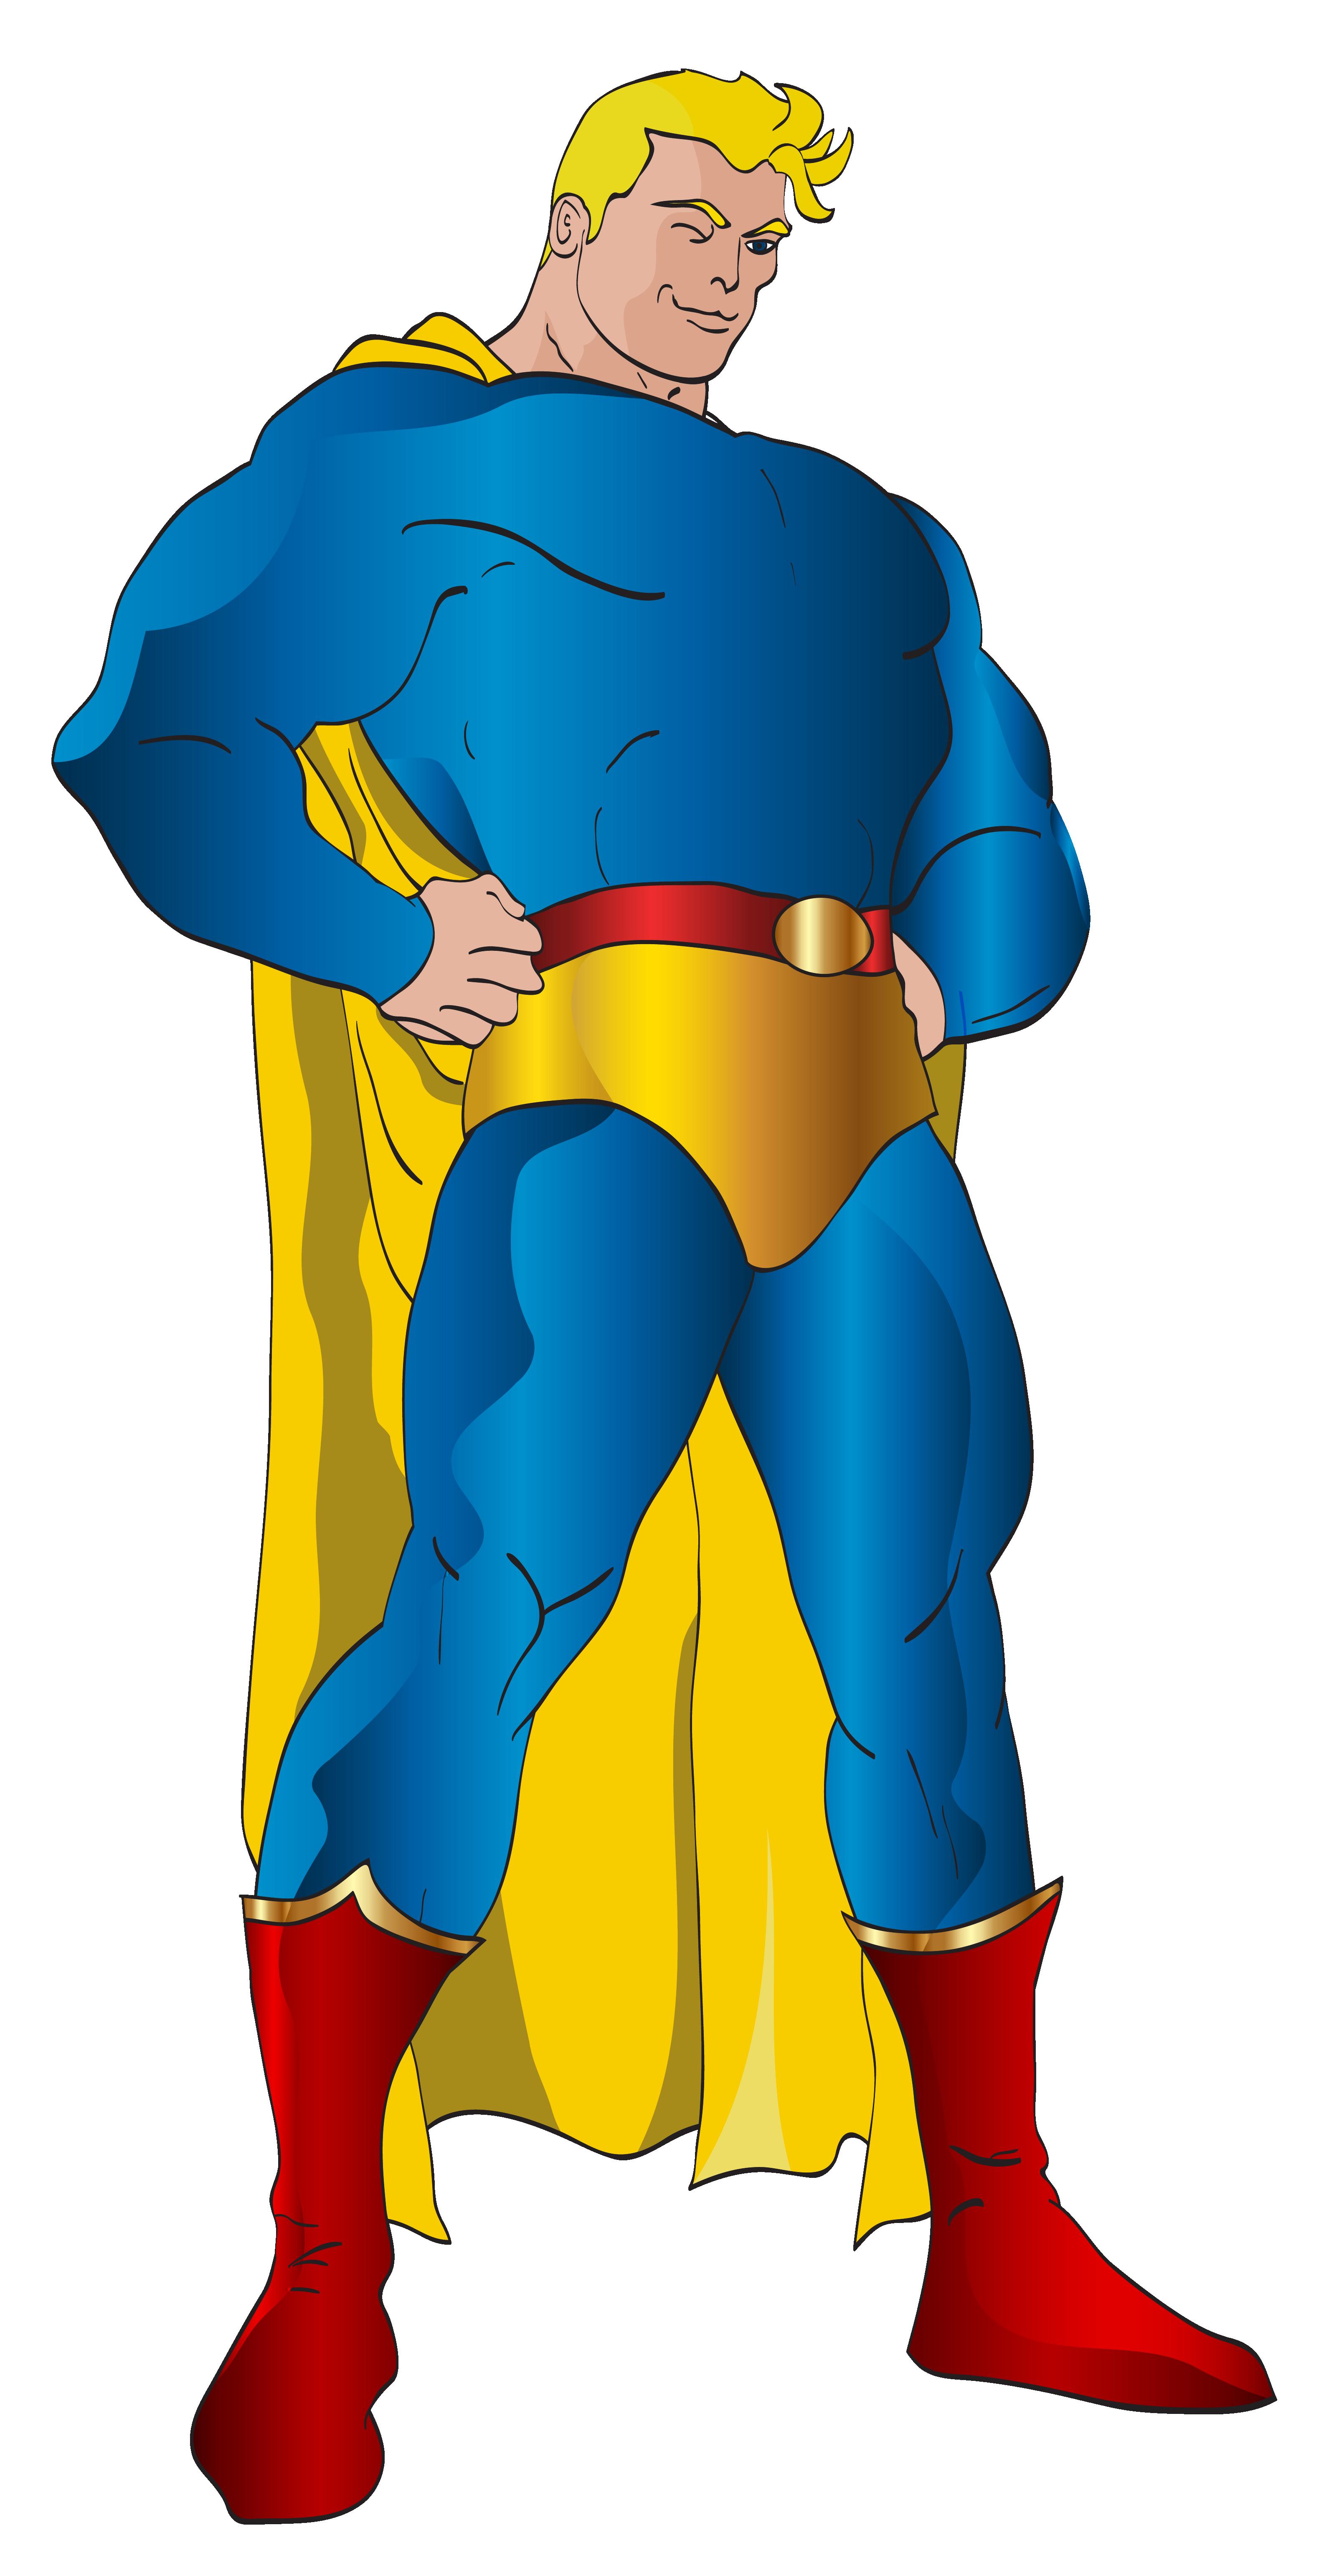 3206x6166 Superhero Png Clip Art Imageu200b Gallery Yopriceville